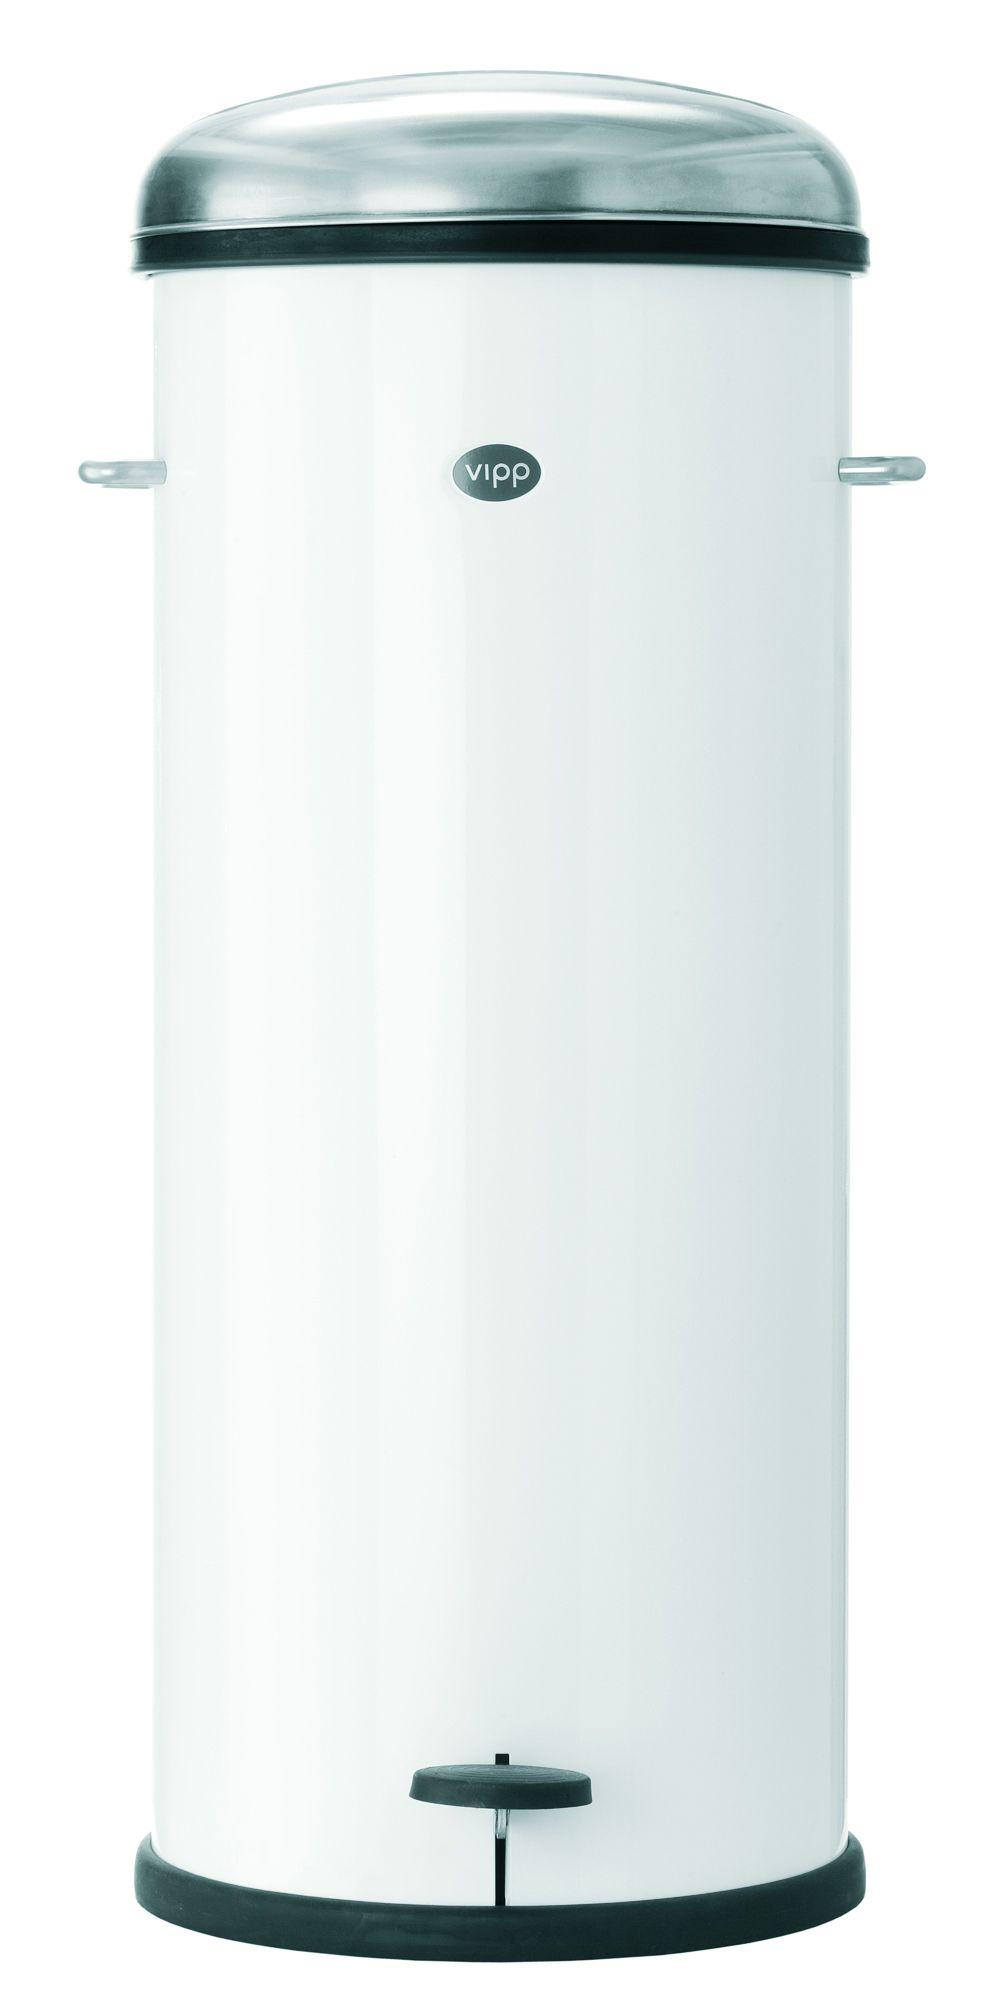 Vipp 17 pedalspand, 30 liter, hvid